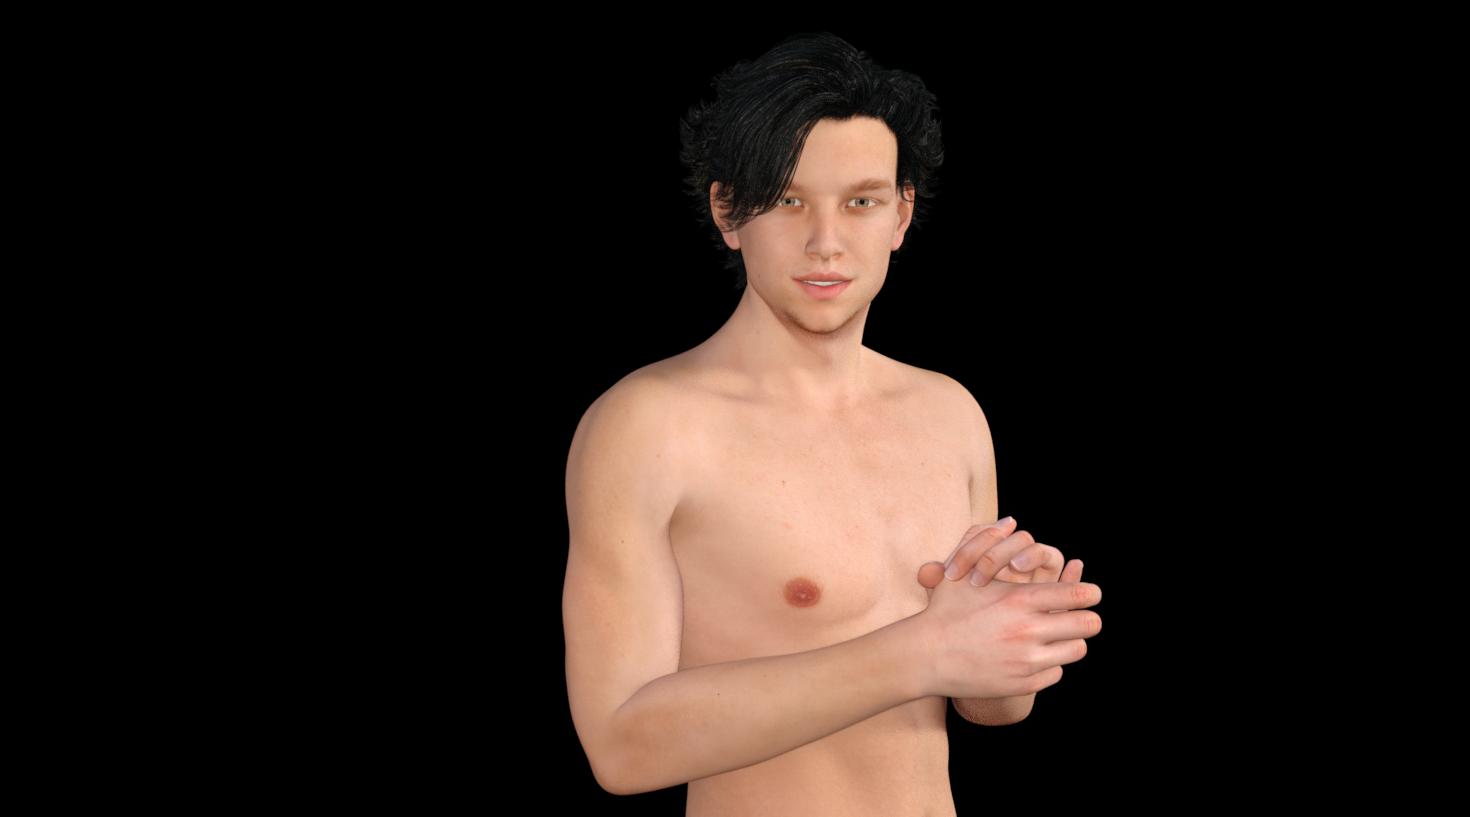 【Daz Studio】男性キャラを制作してみる。